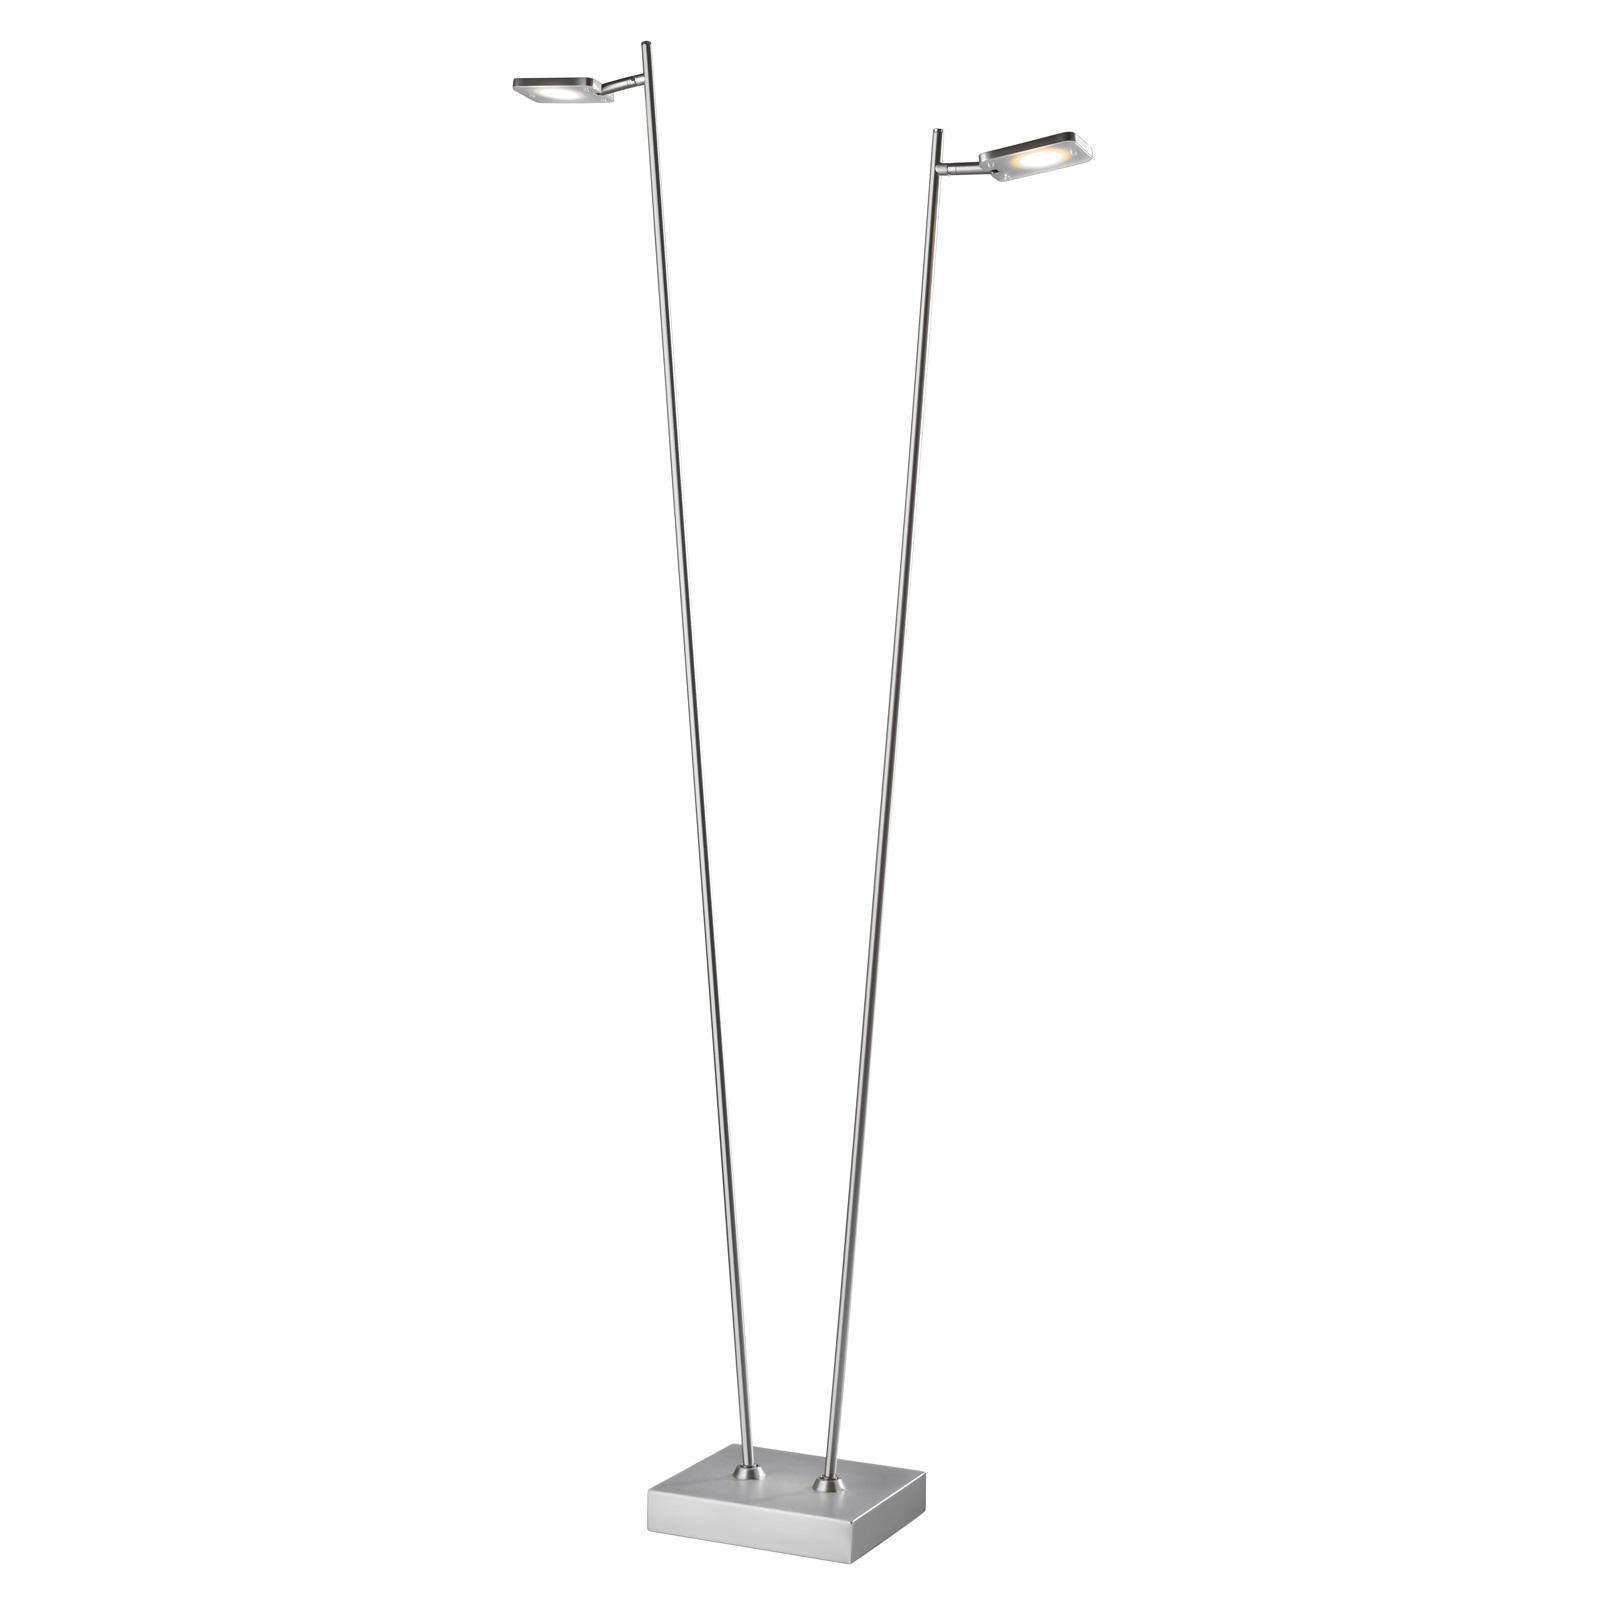 Lampada da terra LED Quad, dimmer 2 luci alluminio